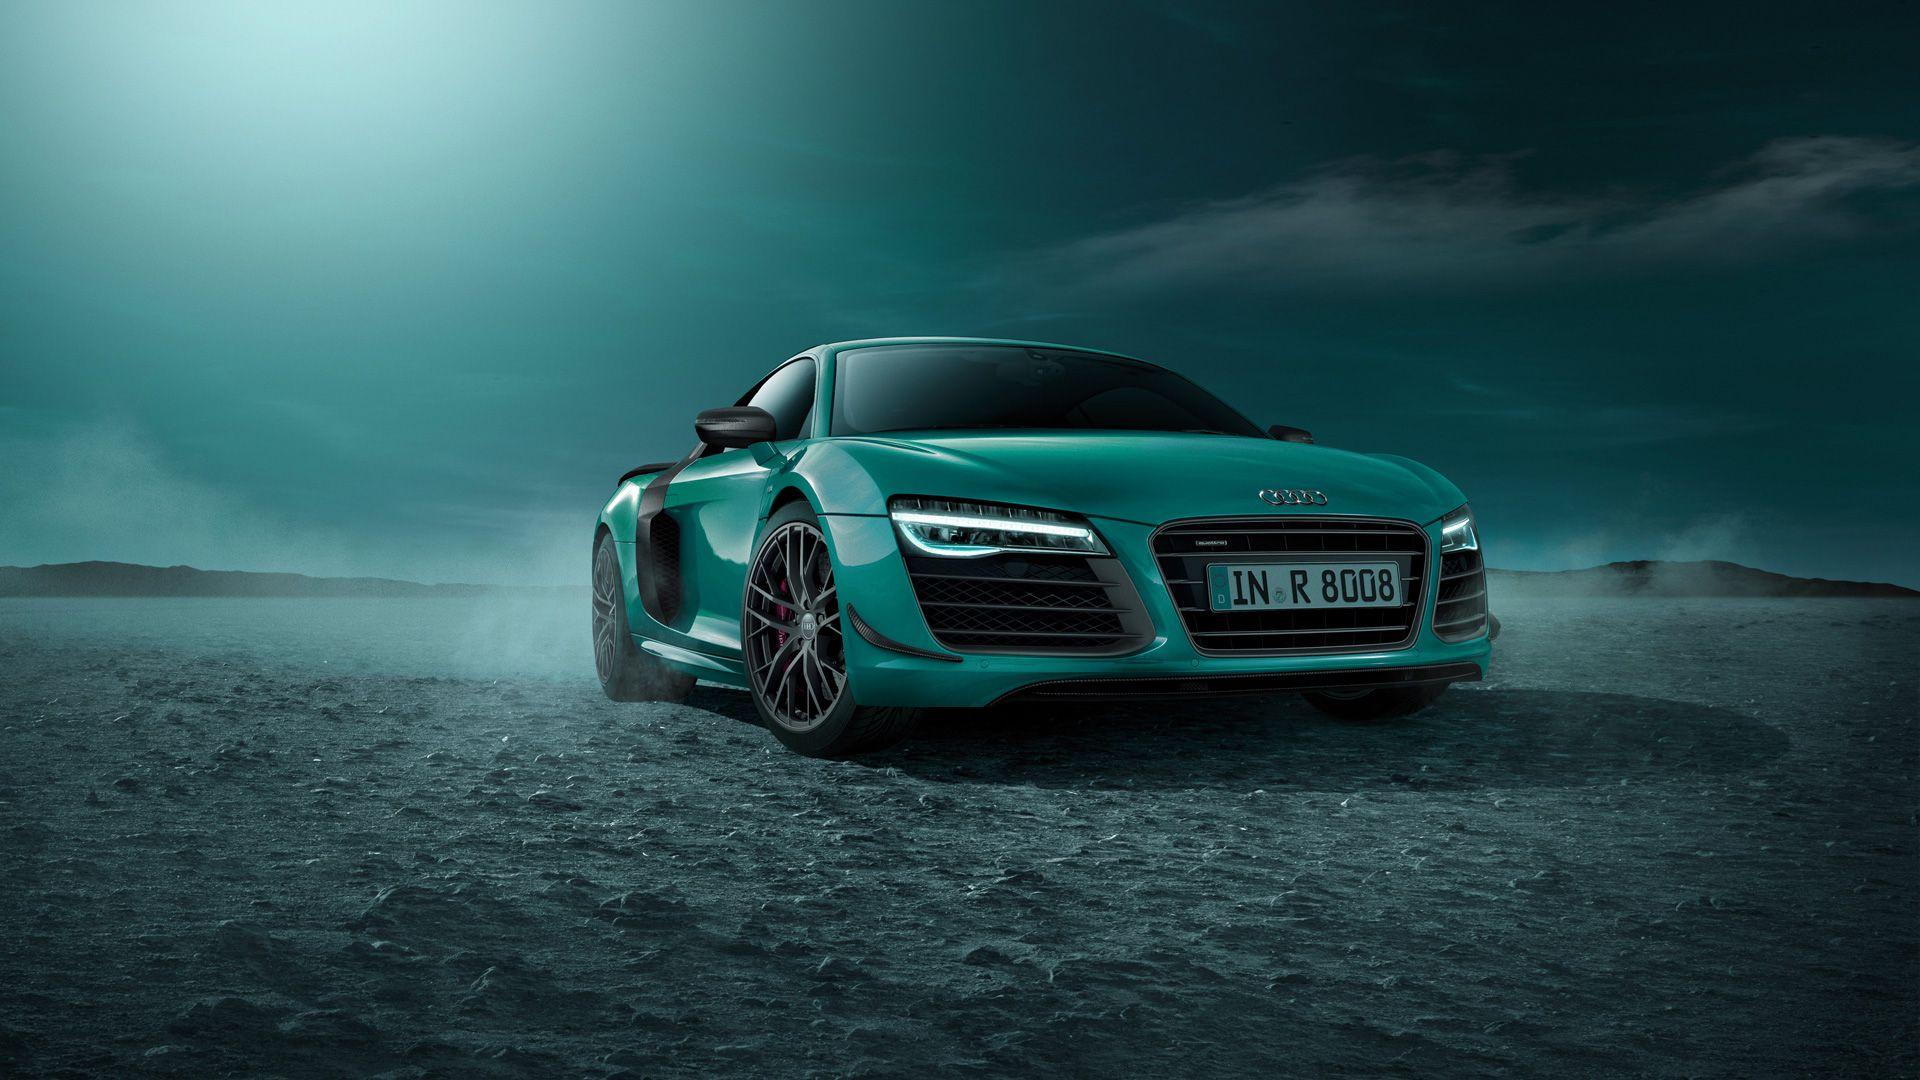 Audi Hd Desktop Wallpapers For Widescreen